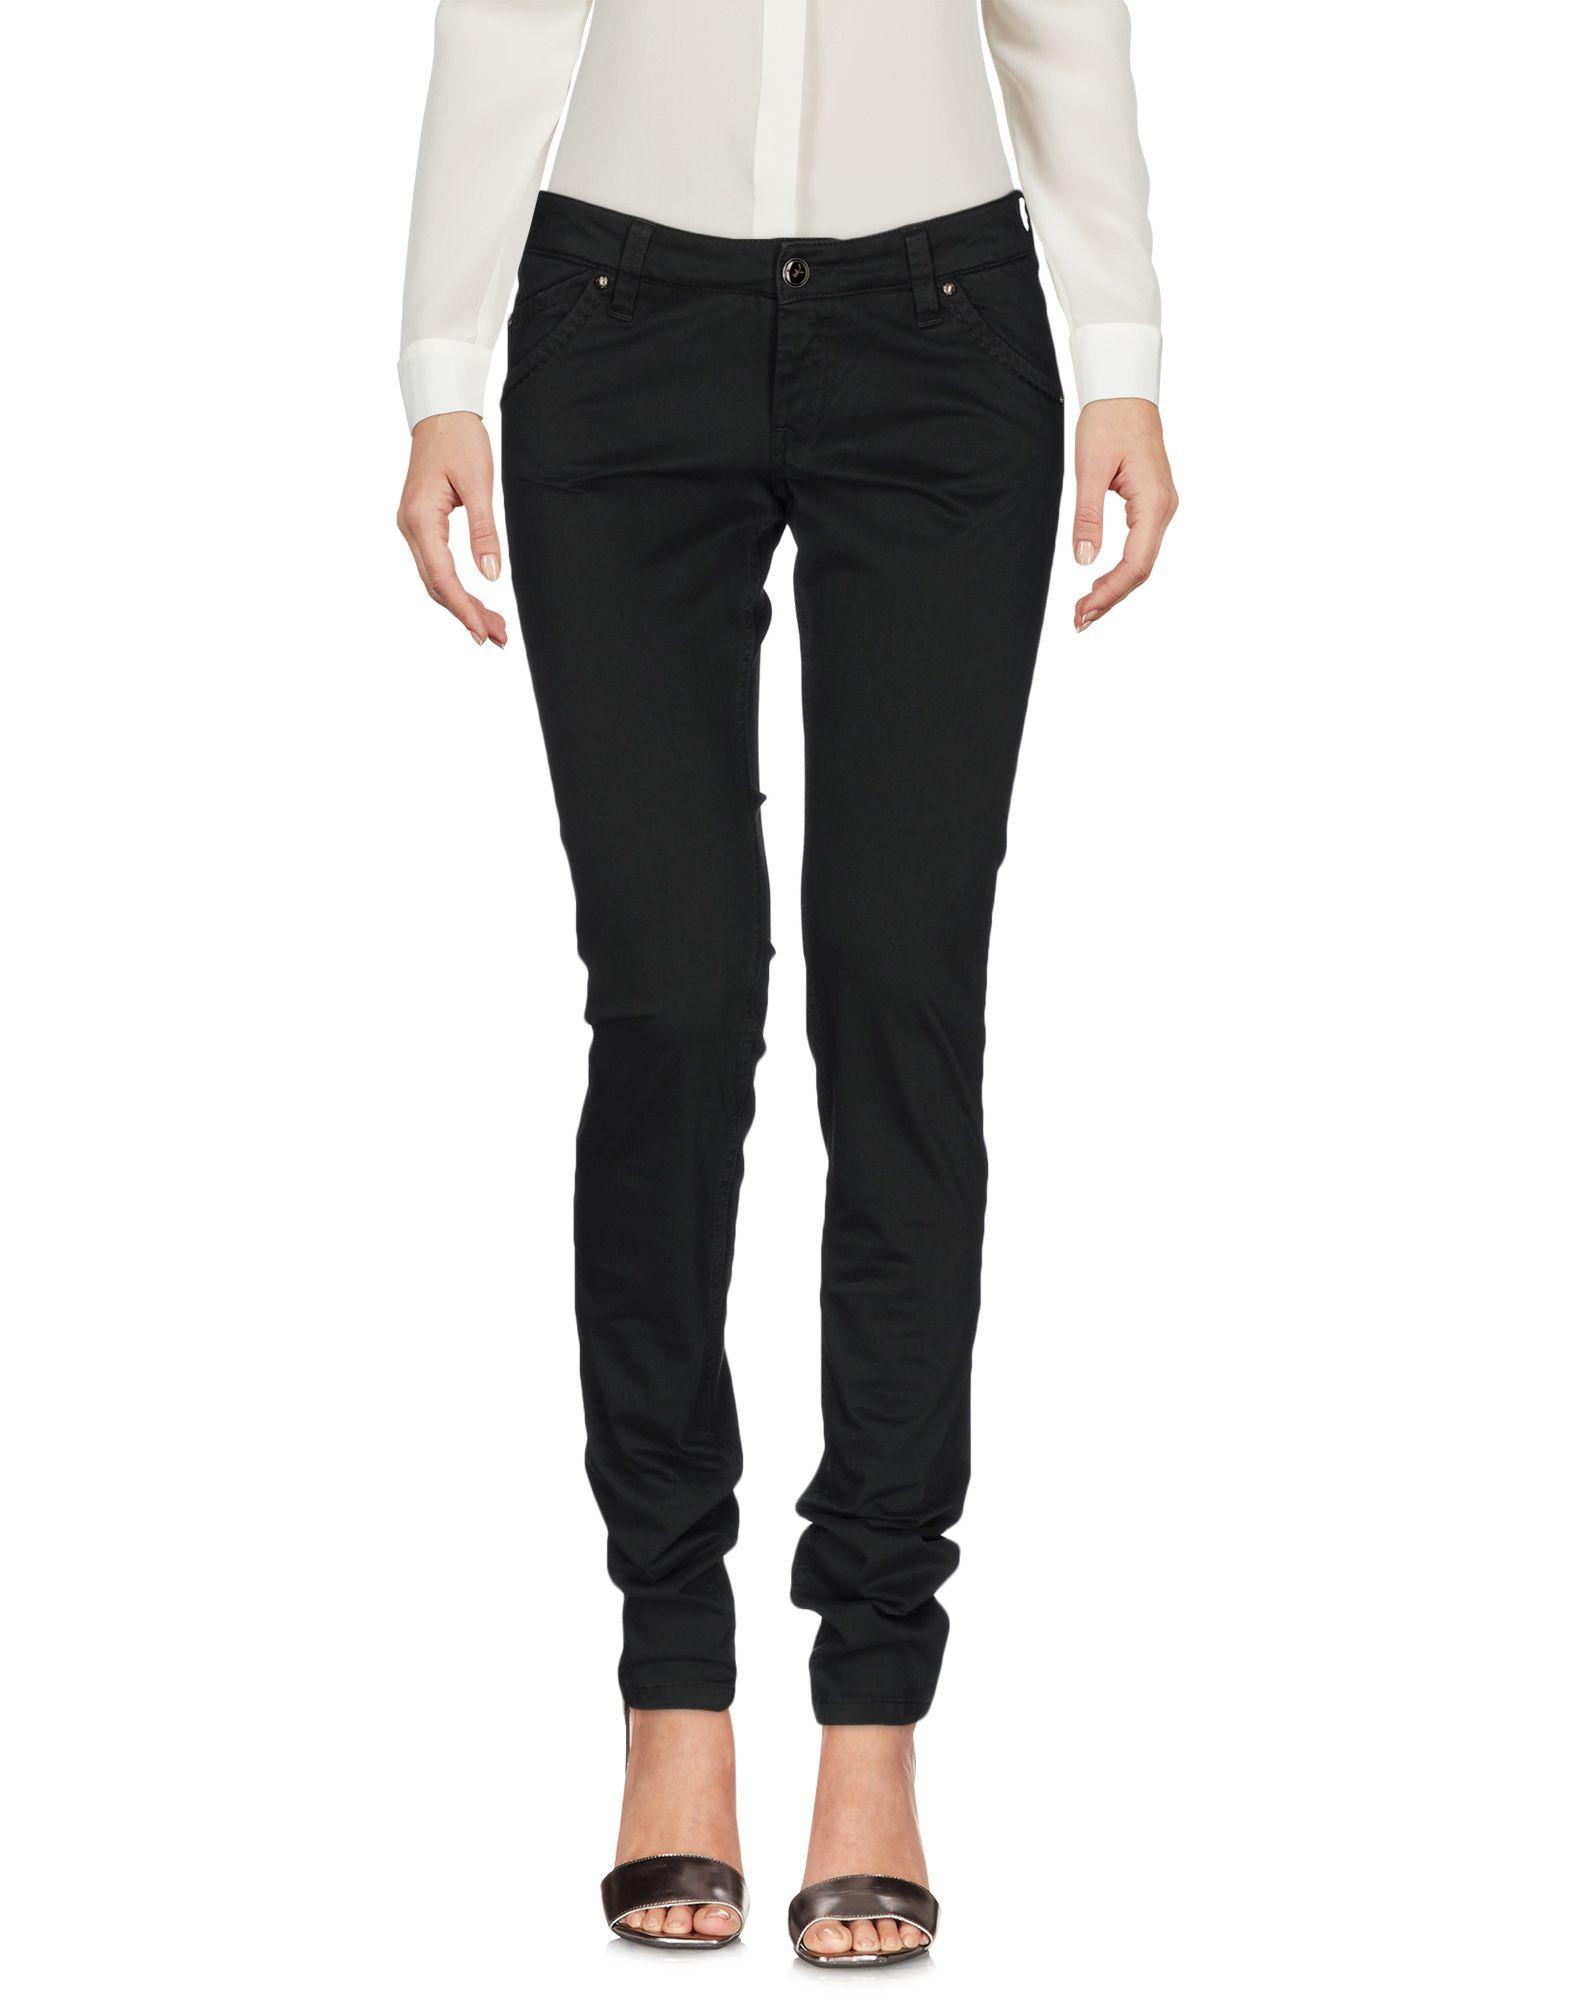 Pantalone Pantalone Re-Hash donna - 36968451JN  Verkaufsstelle